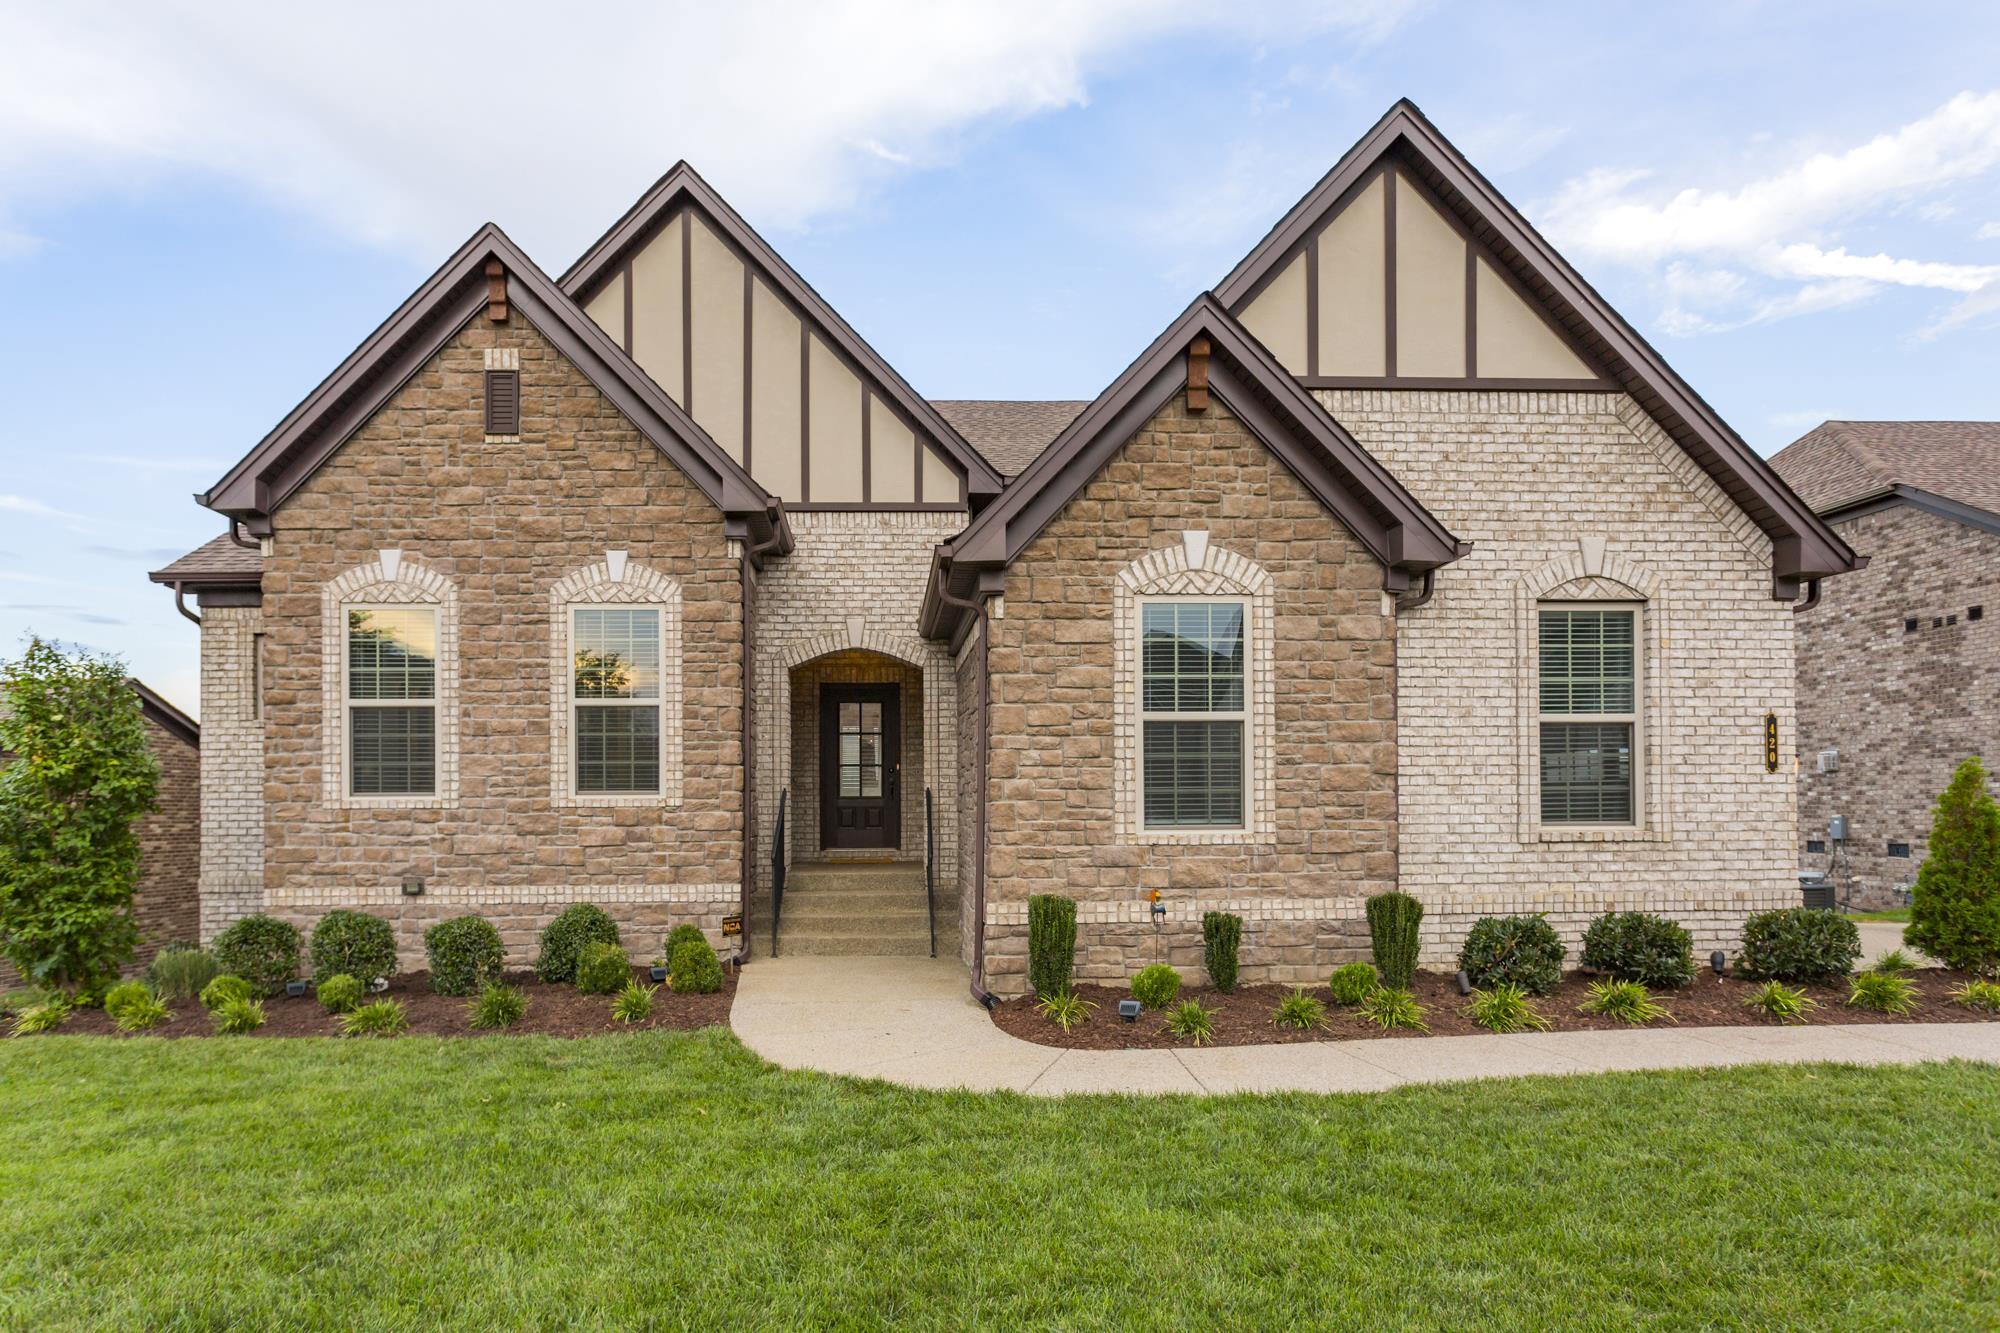 420 Larkhill Ln, Nolensville, Tennessee